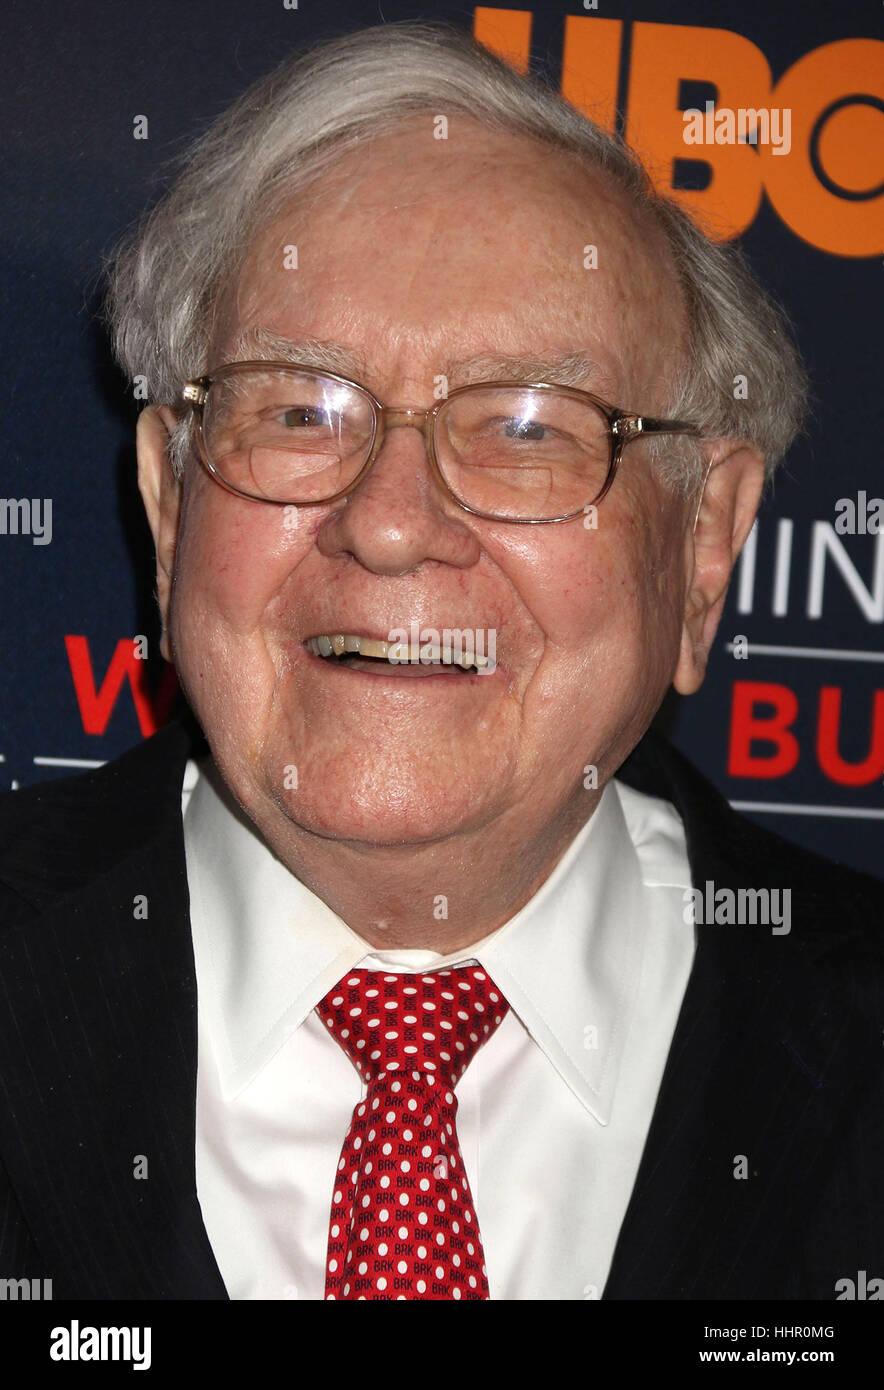 New York, USA. 19th Jan, 2017. Businessman Warren Buffett attends the world premiere of the HBO film 'Becoming Warren Stock Photo